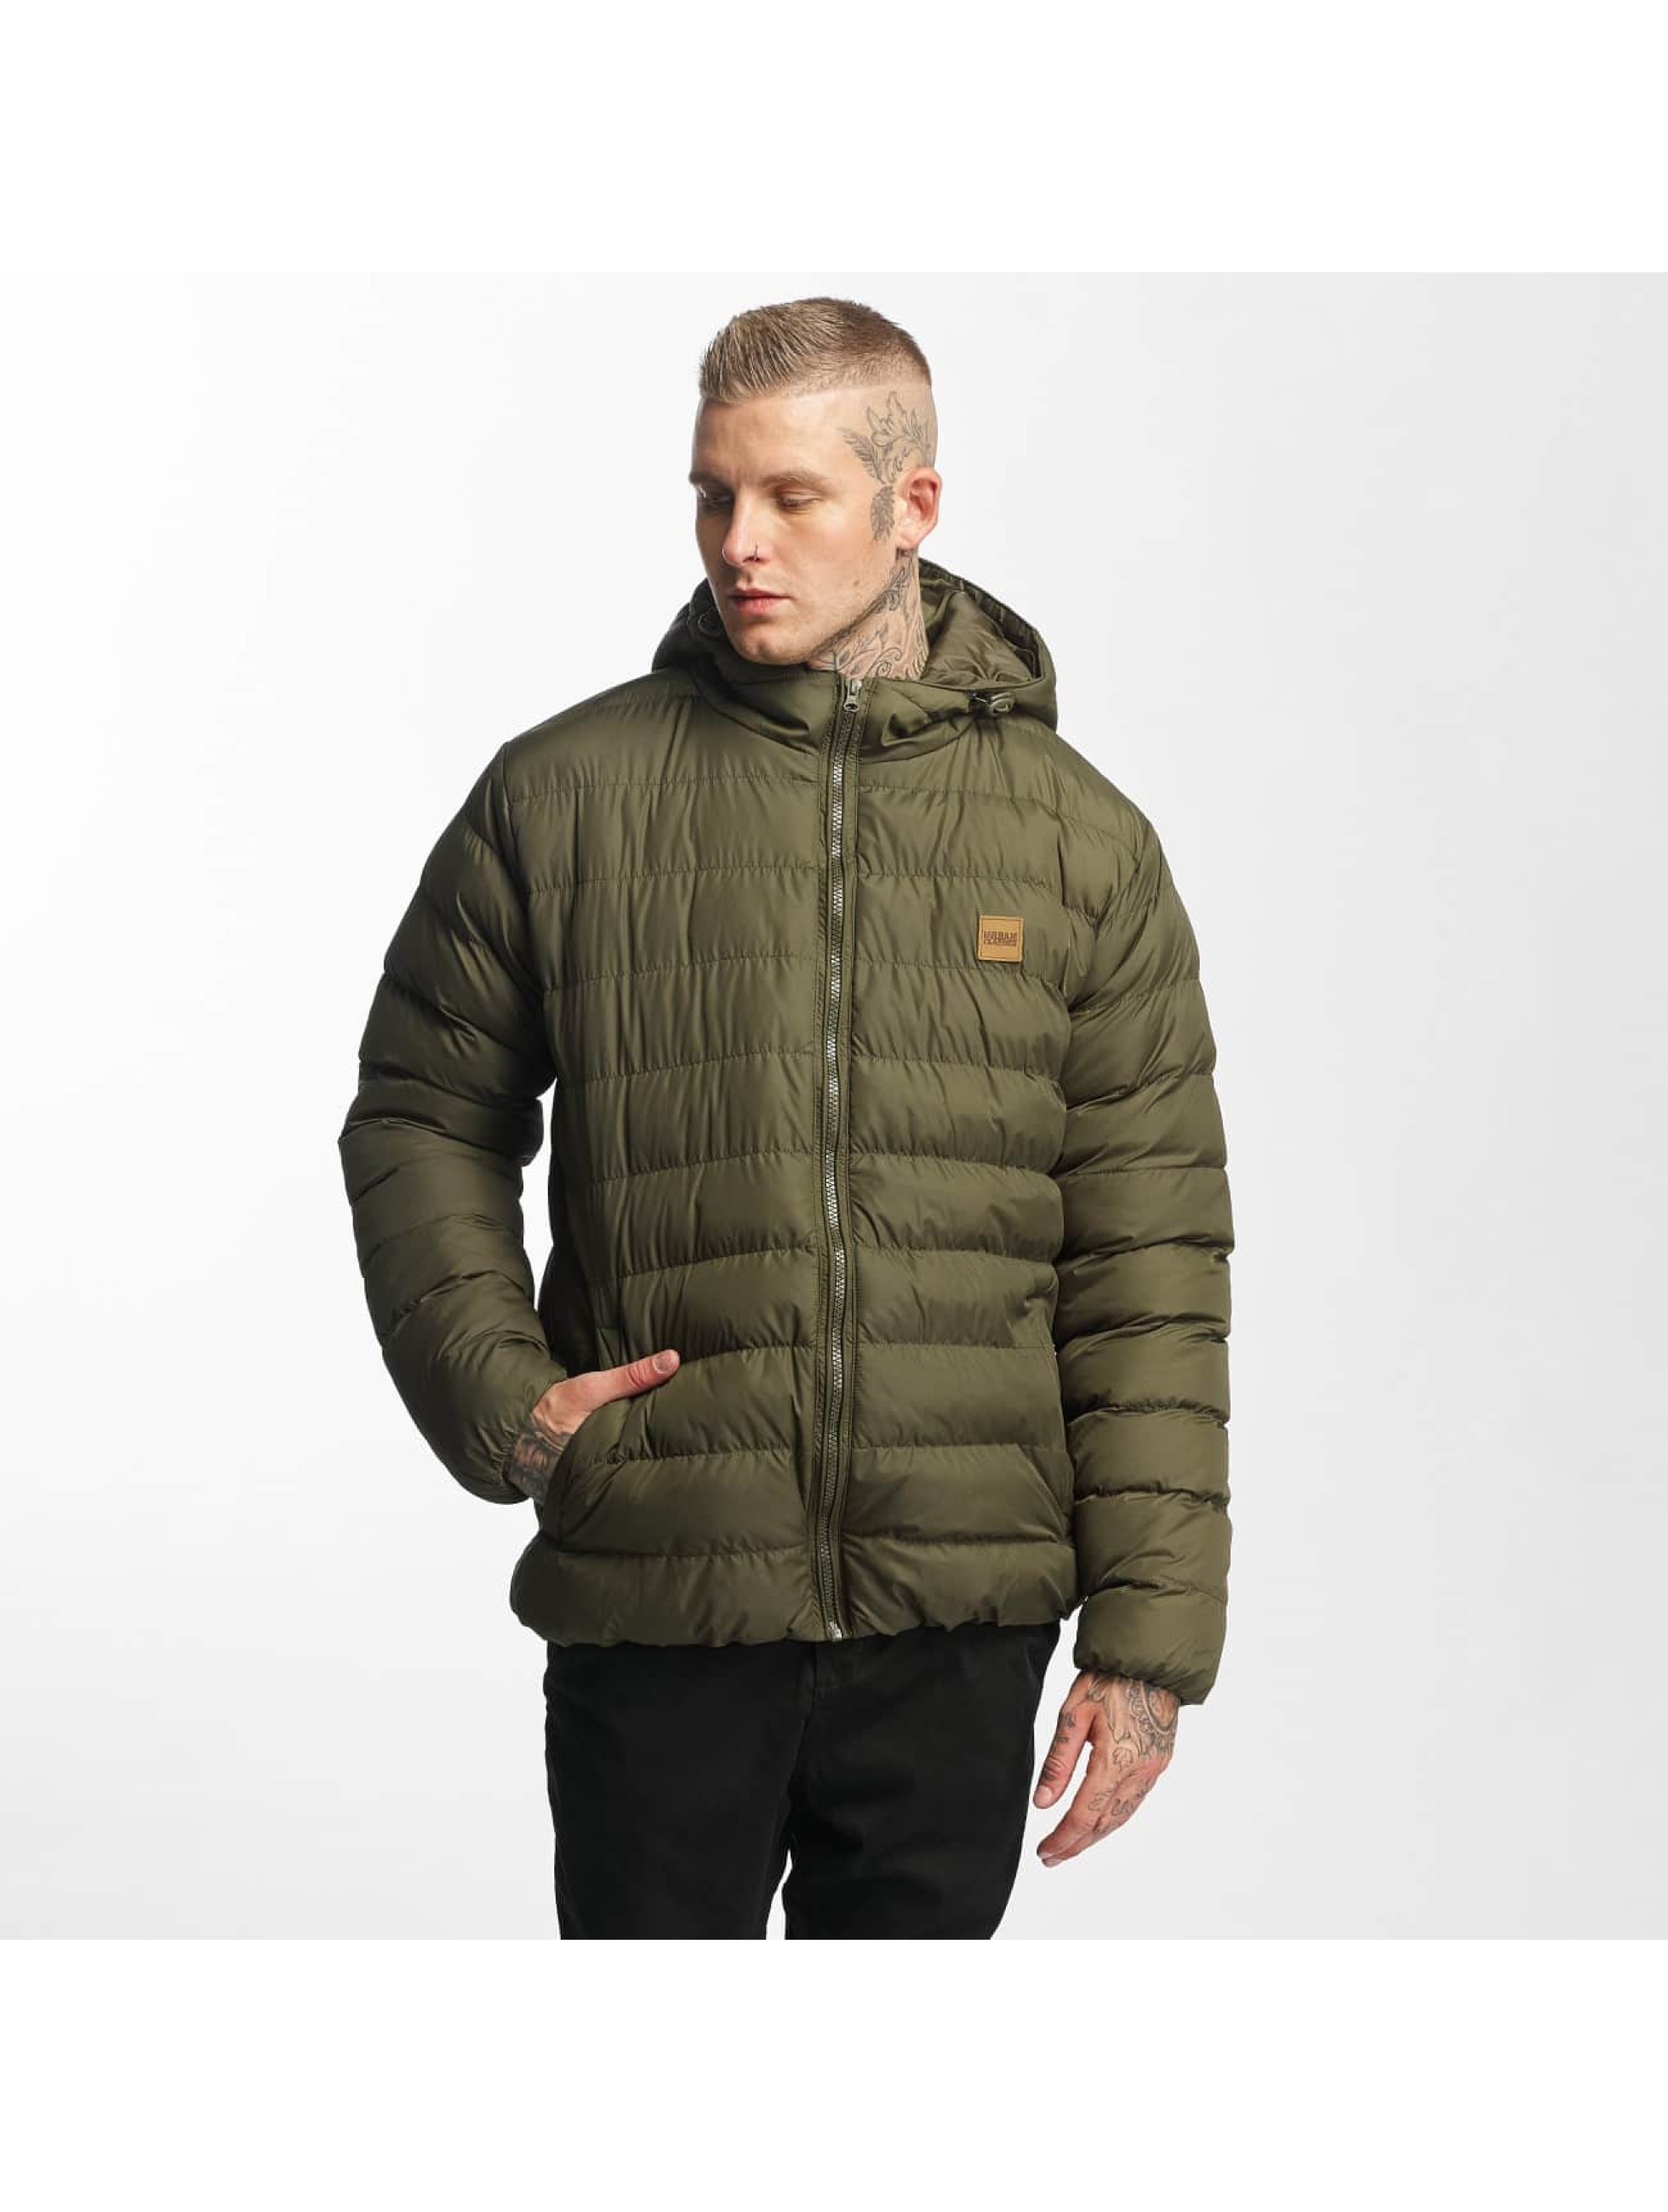 f7ed91ddf471a Automne-hiver 2017 2018   11 tendances mode homme   DefShop France Blog